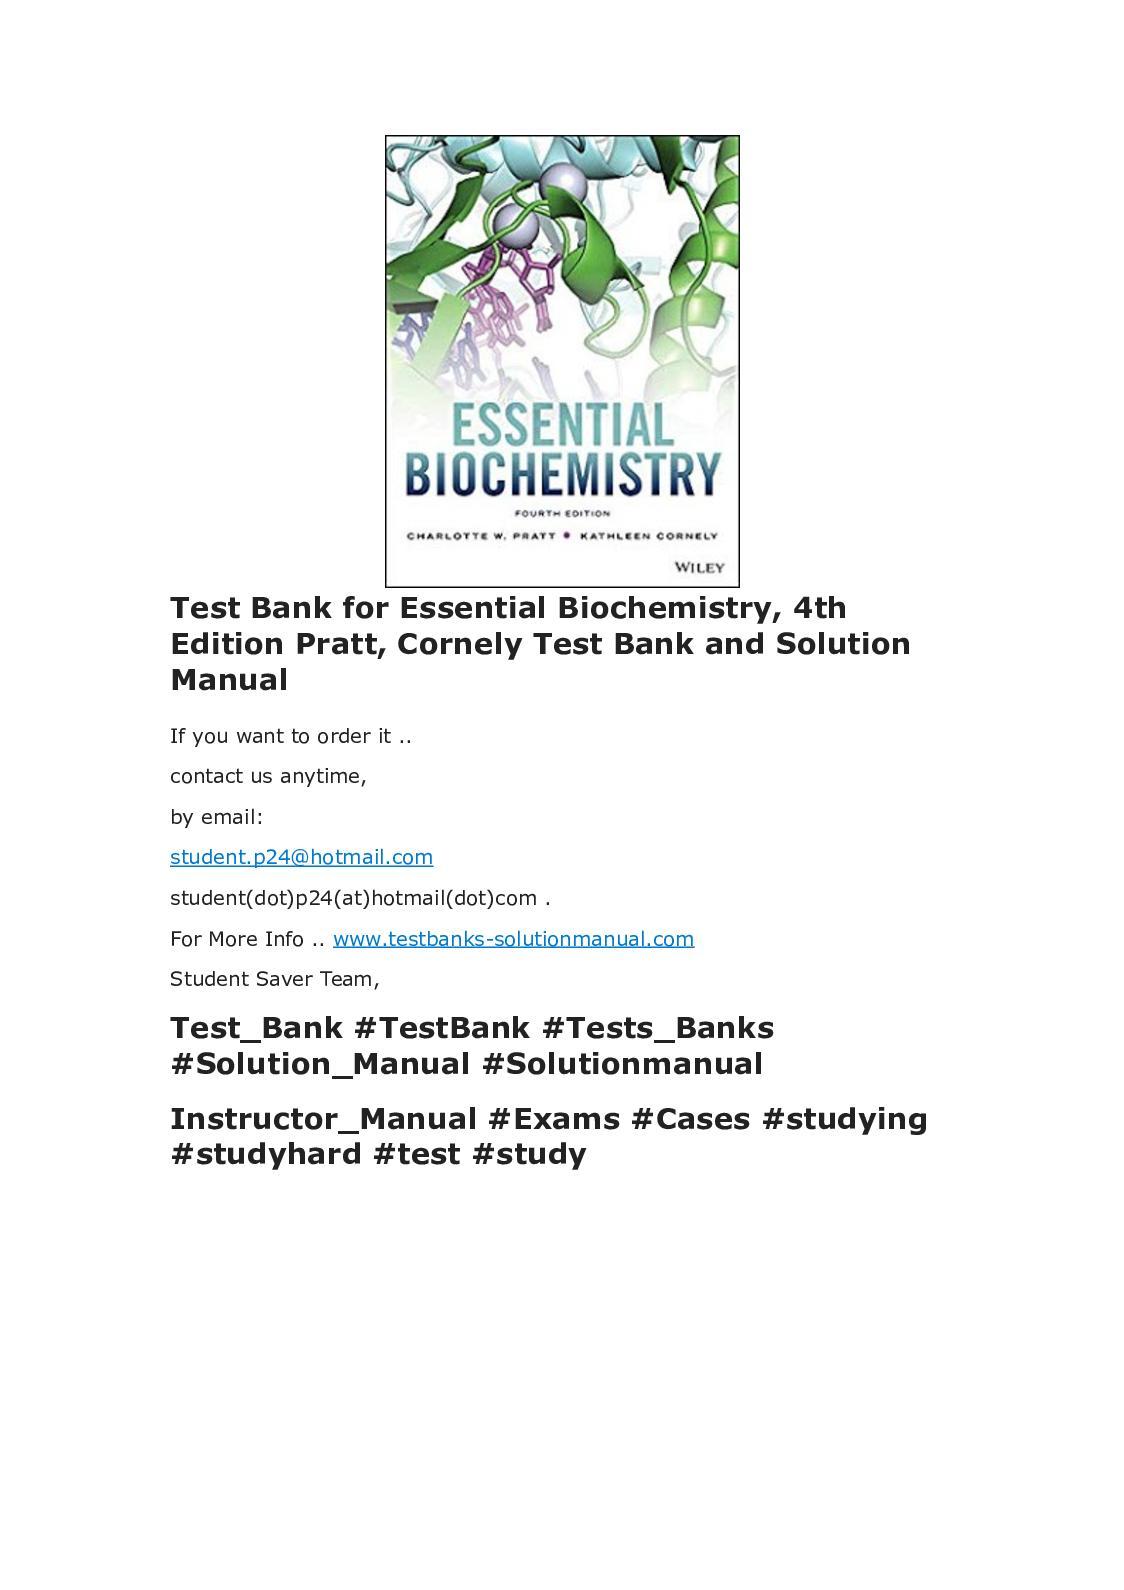 calam o test bank for essential biochemistry 4th edition pratt rh calameo com essential biochemistry pratt solutions manual Test Bank Solutions Manual